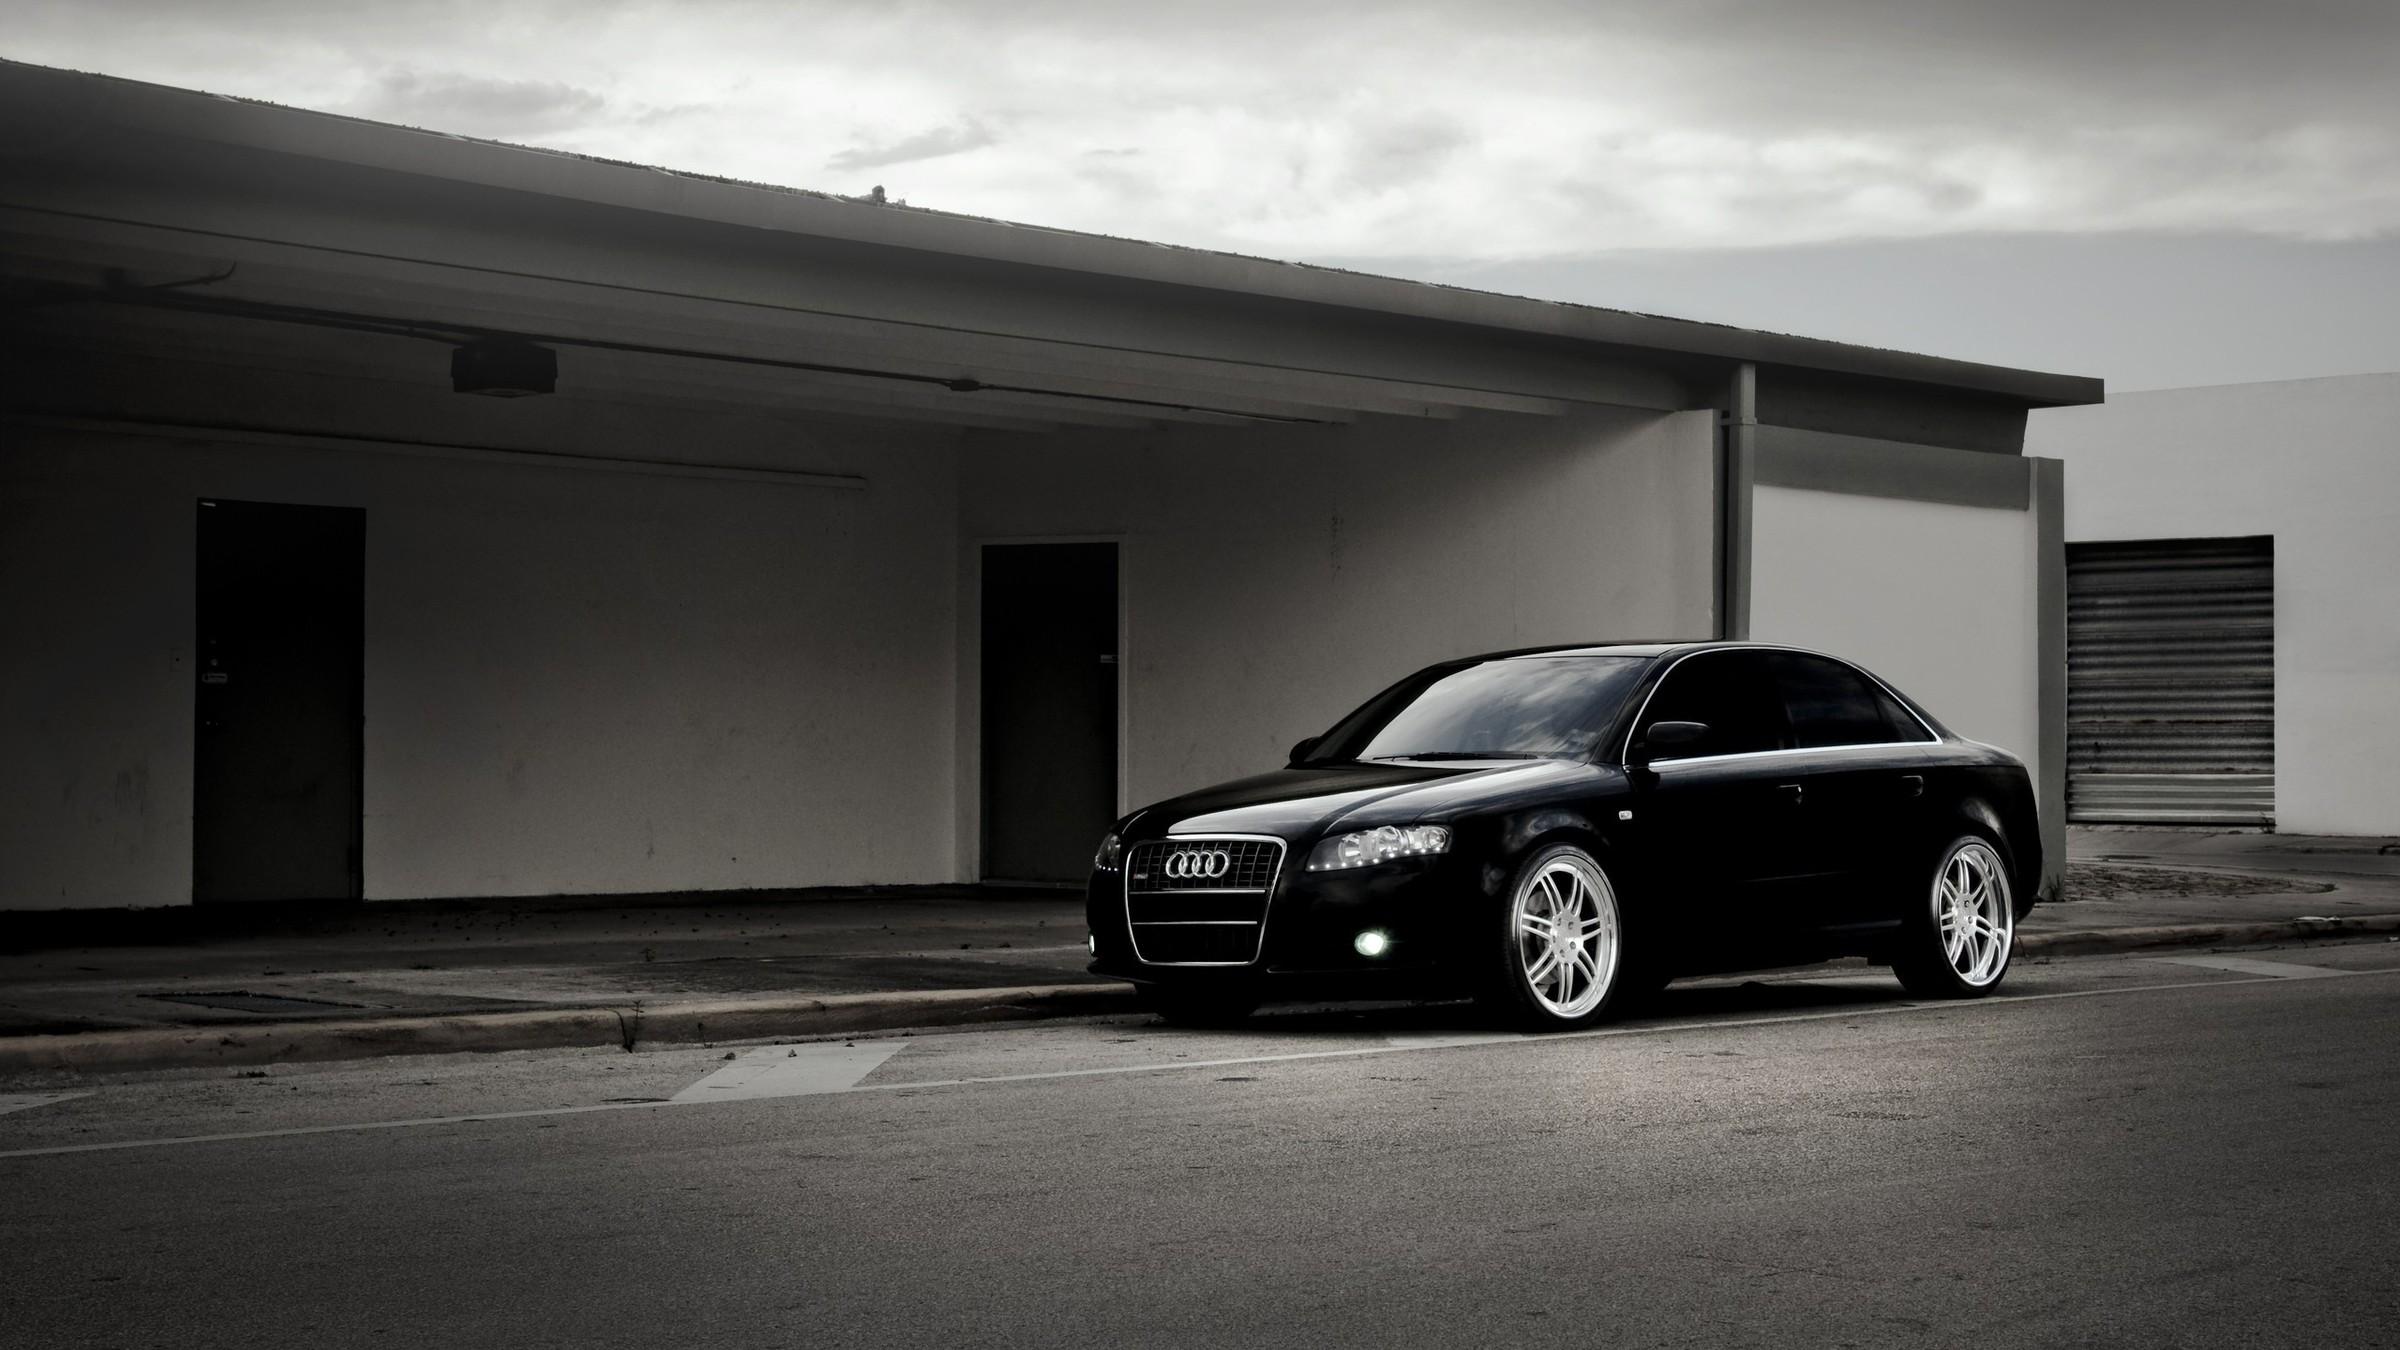 Back To 97 Audi A4 Wallpapers Hd Audi A4 B7 Black